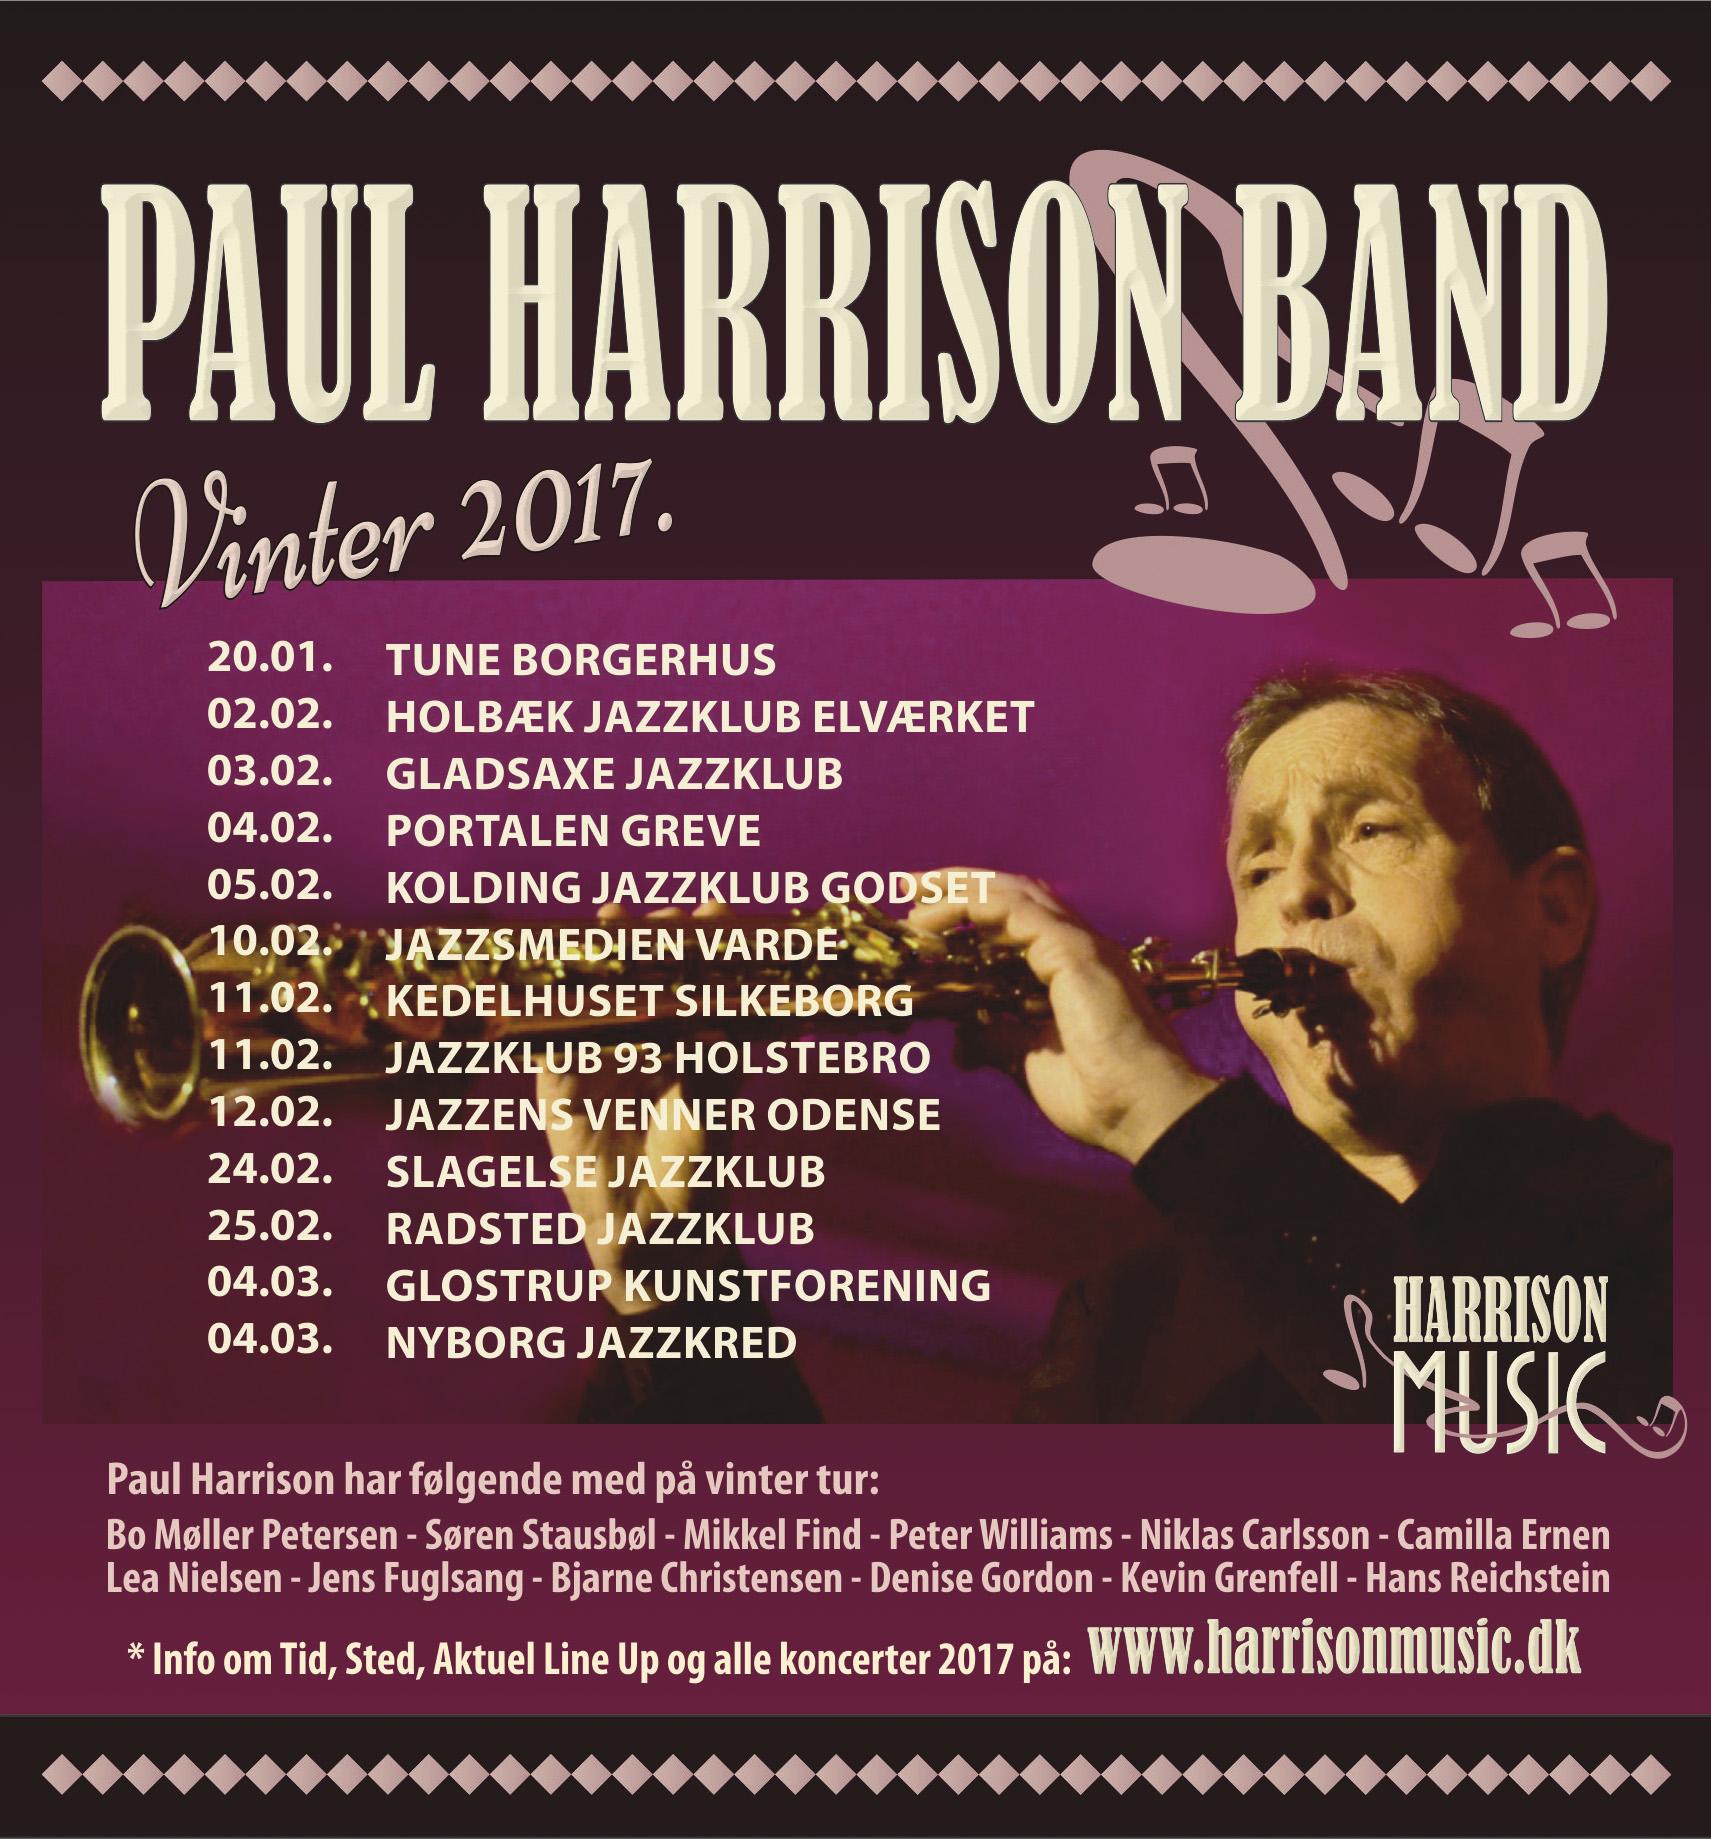 PAUL HARRISON BAND - Vinter 2017.